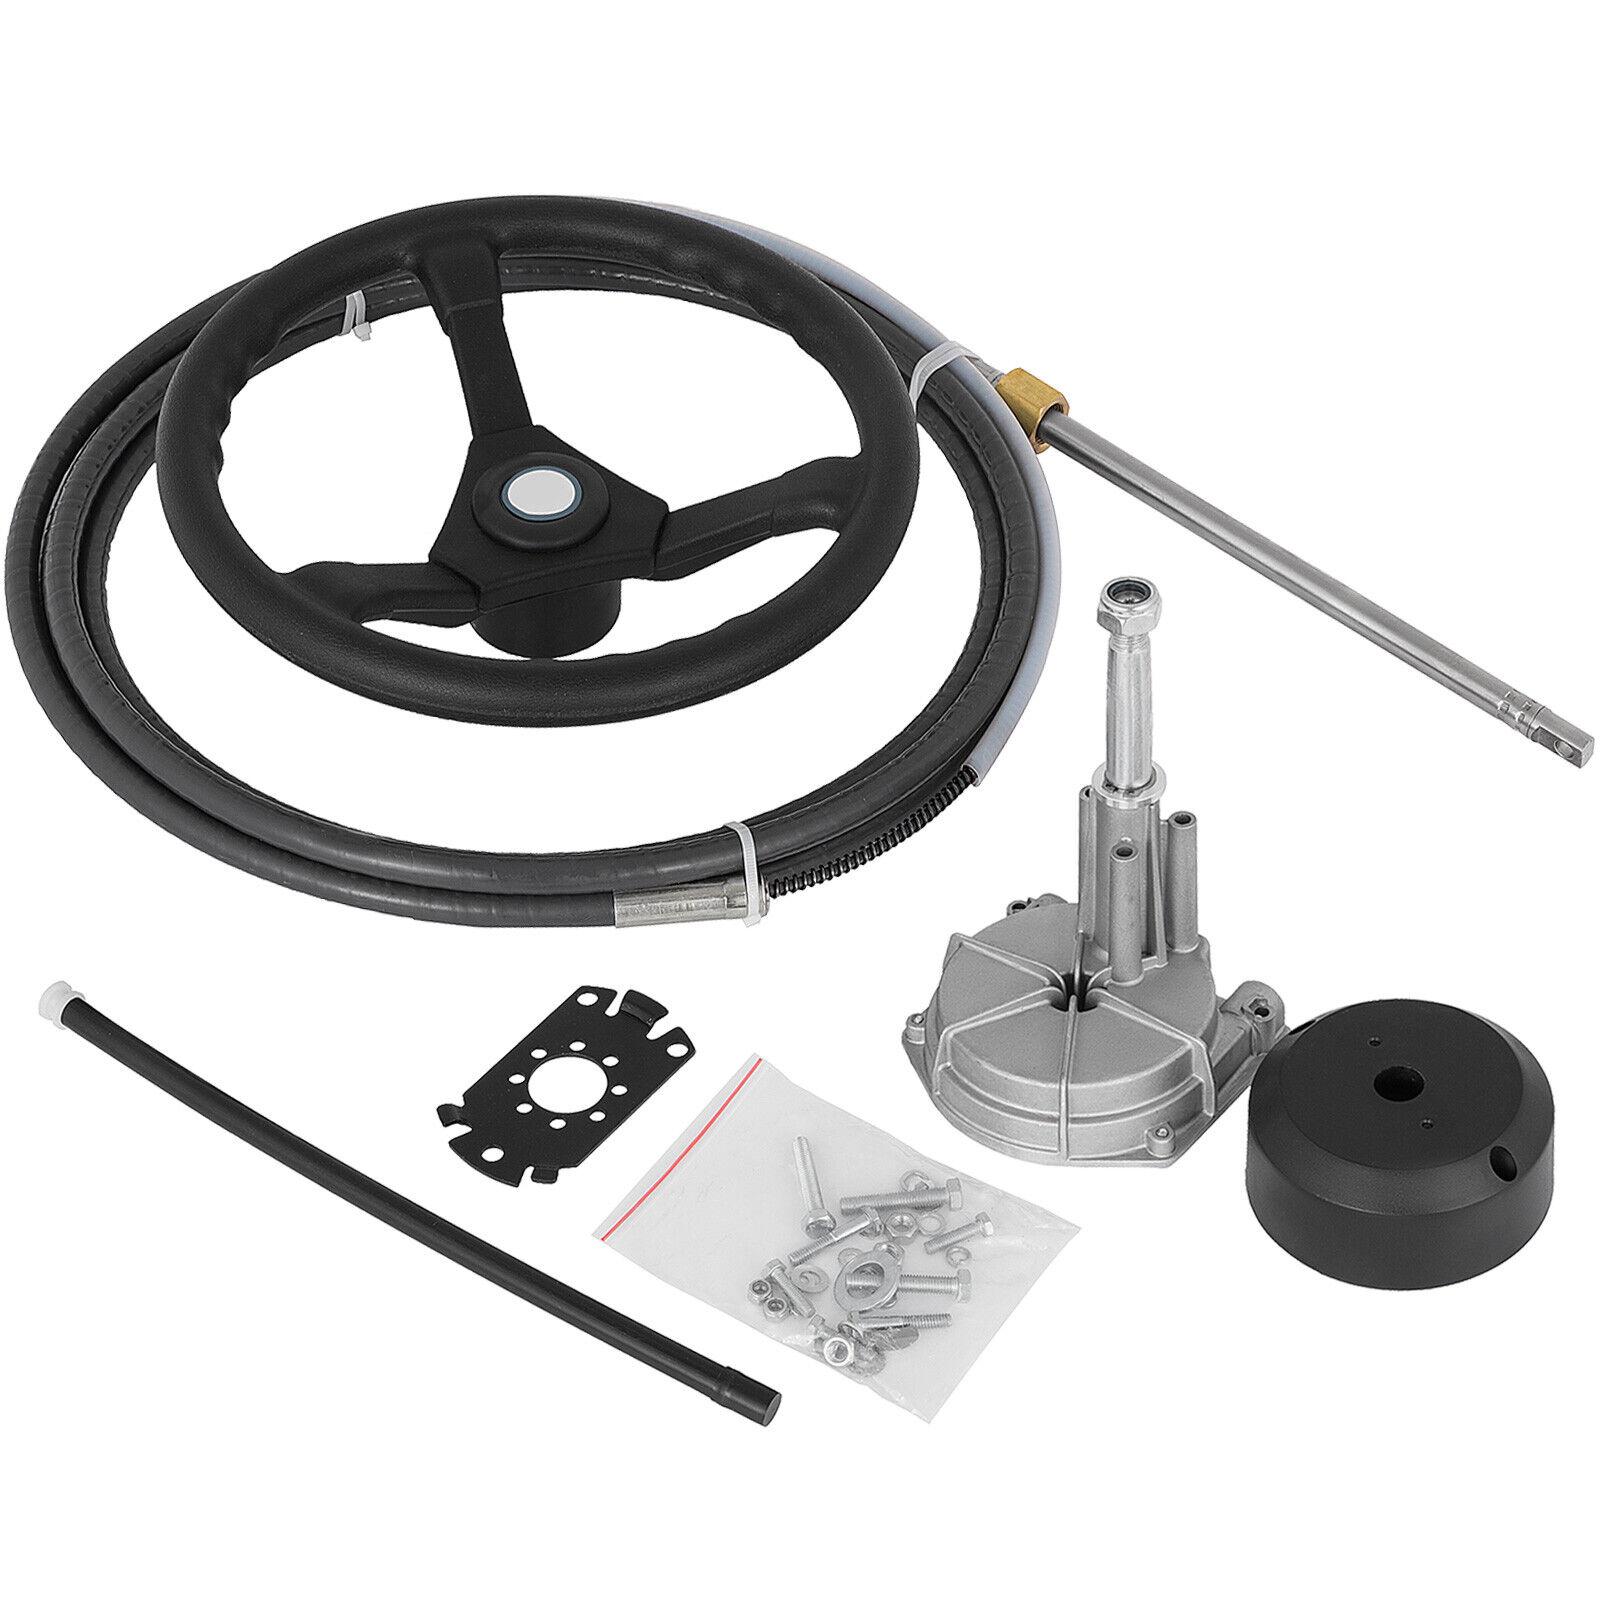 Teleflex Ss13714 Quick Connect Steer Pkg 14 For Sale Online Ebay